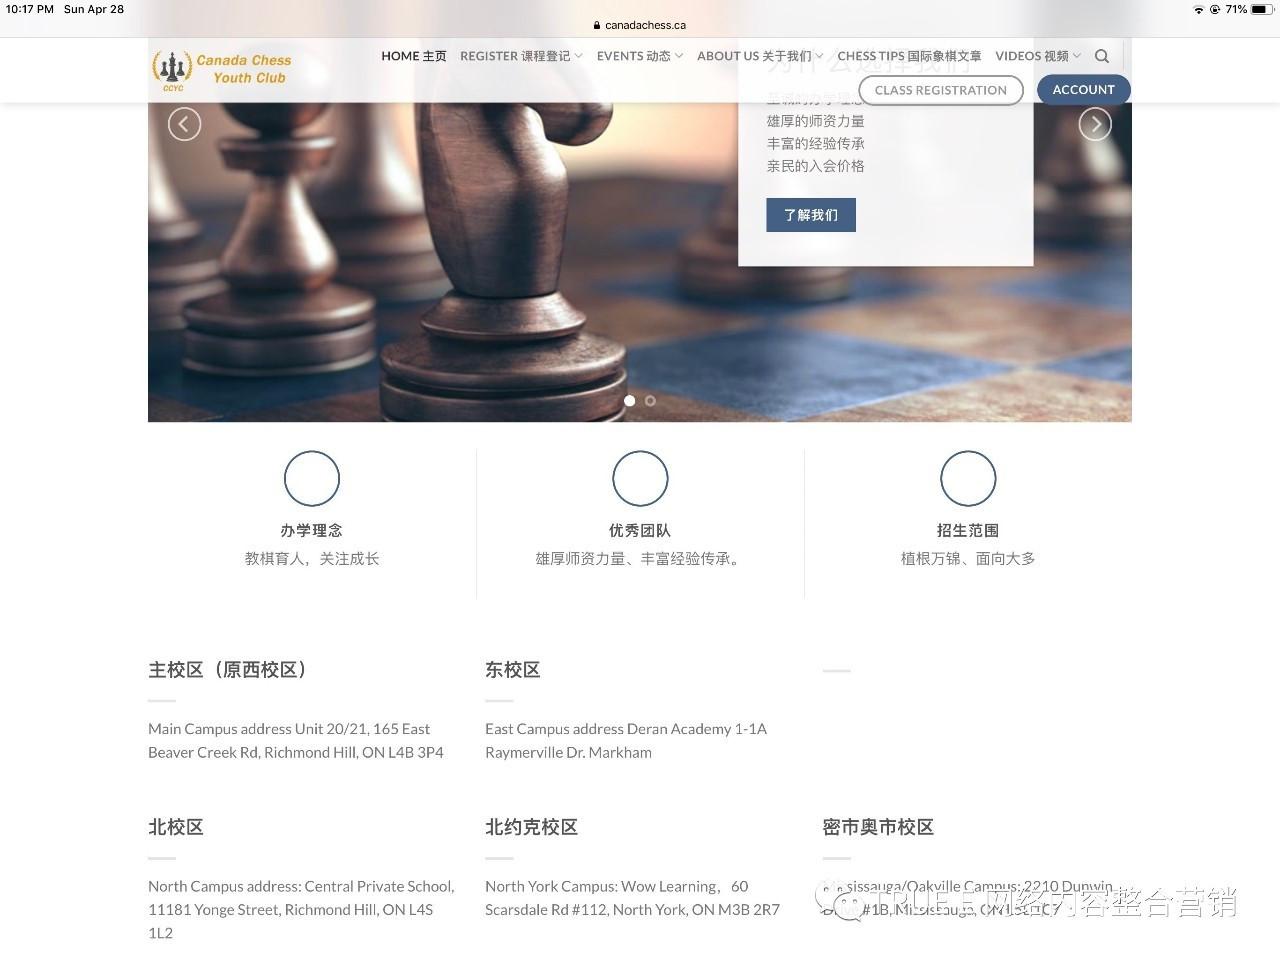 CCYC website